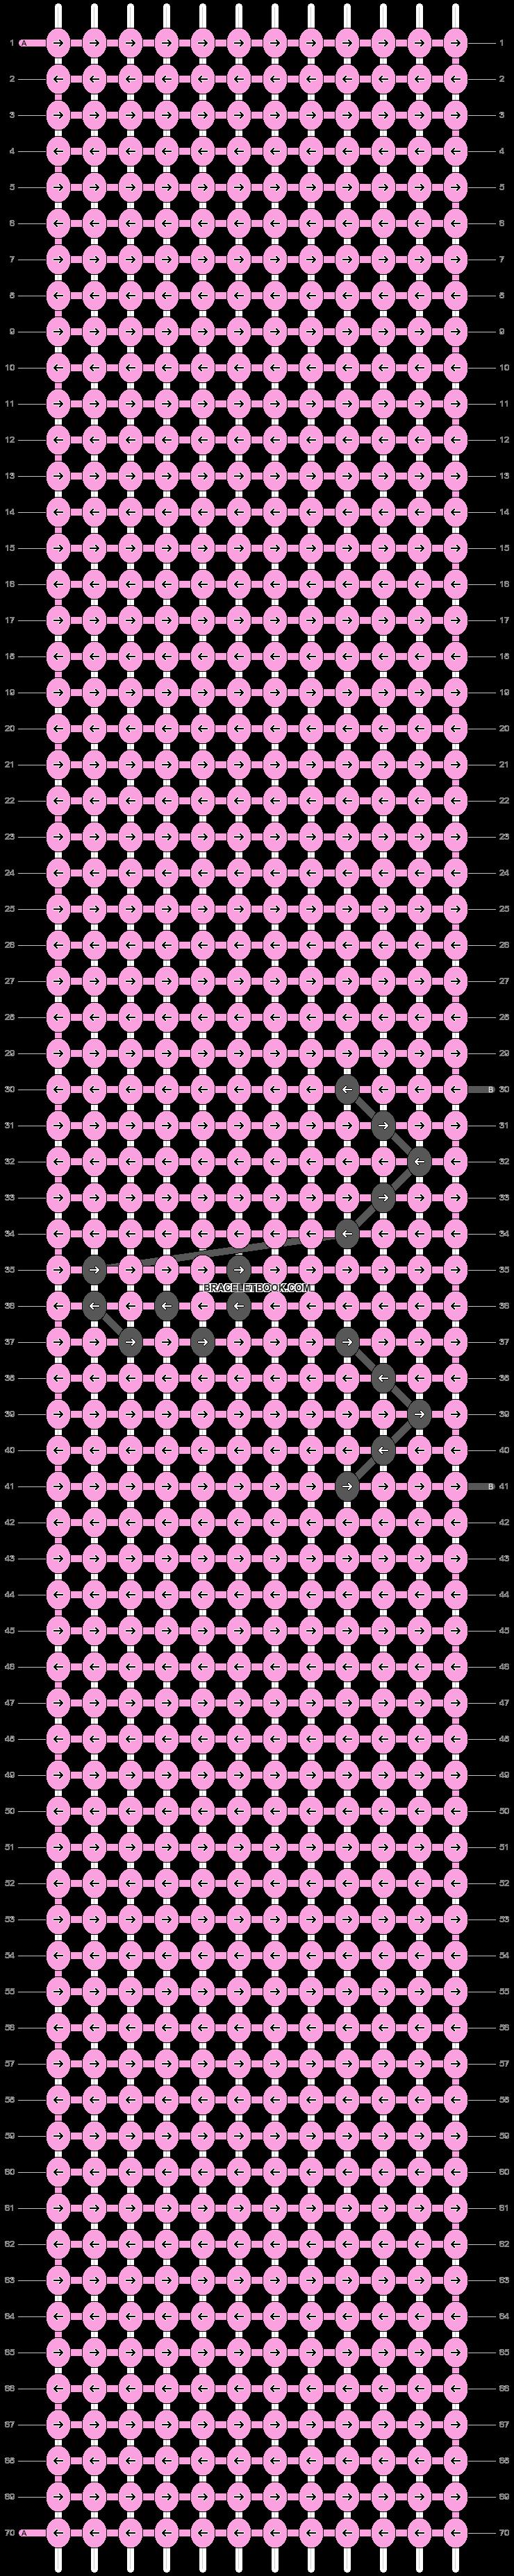 Alpha pattern #93859 variation #170667 pattern